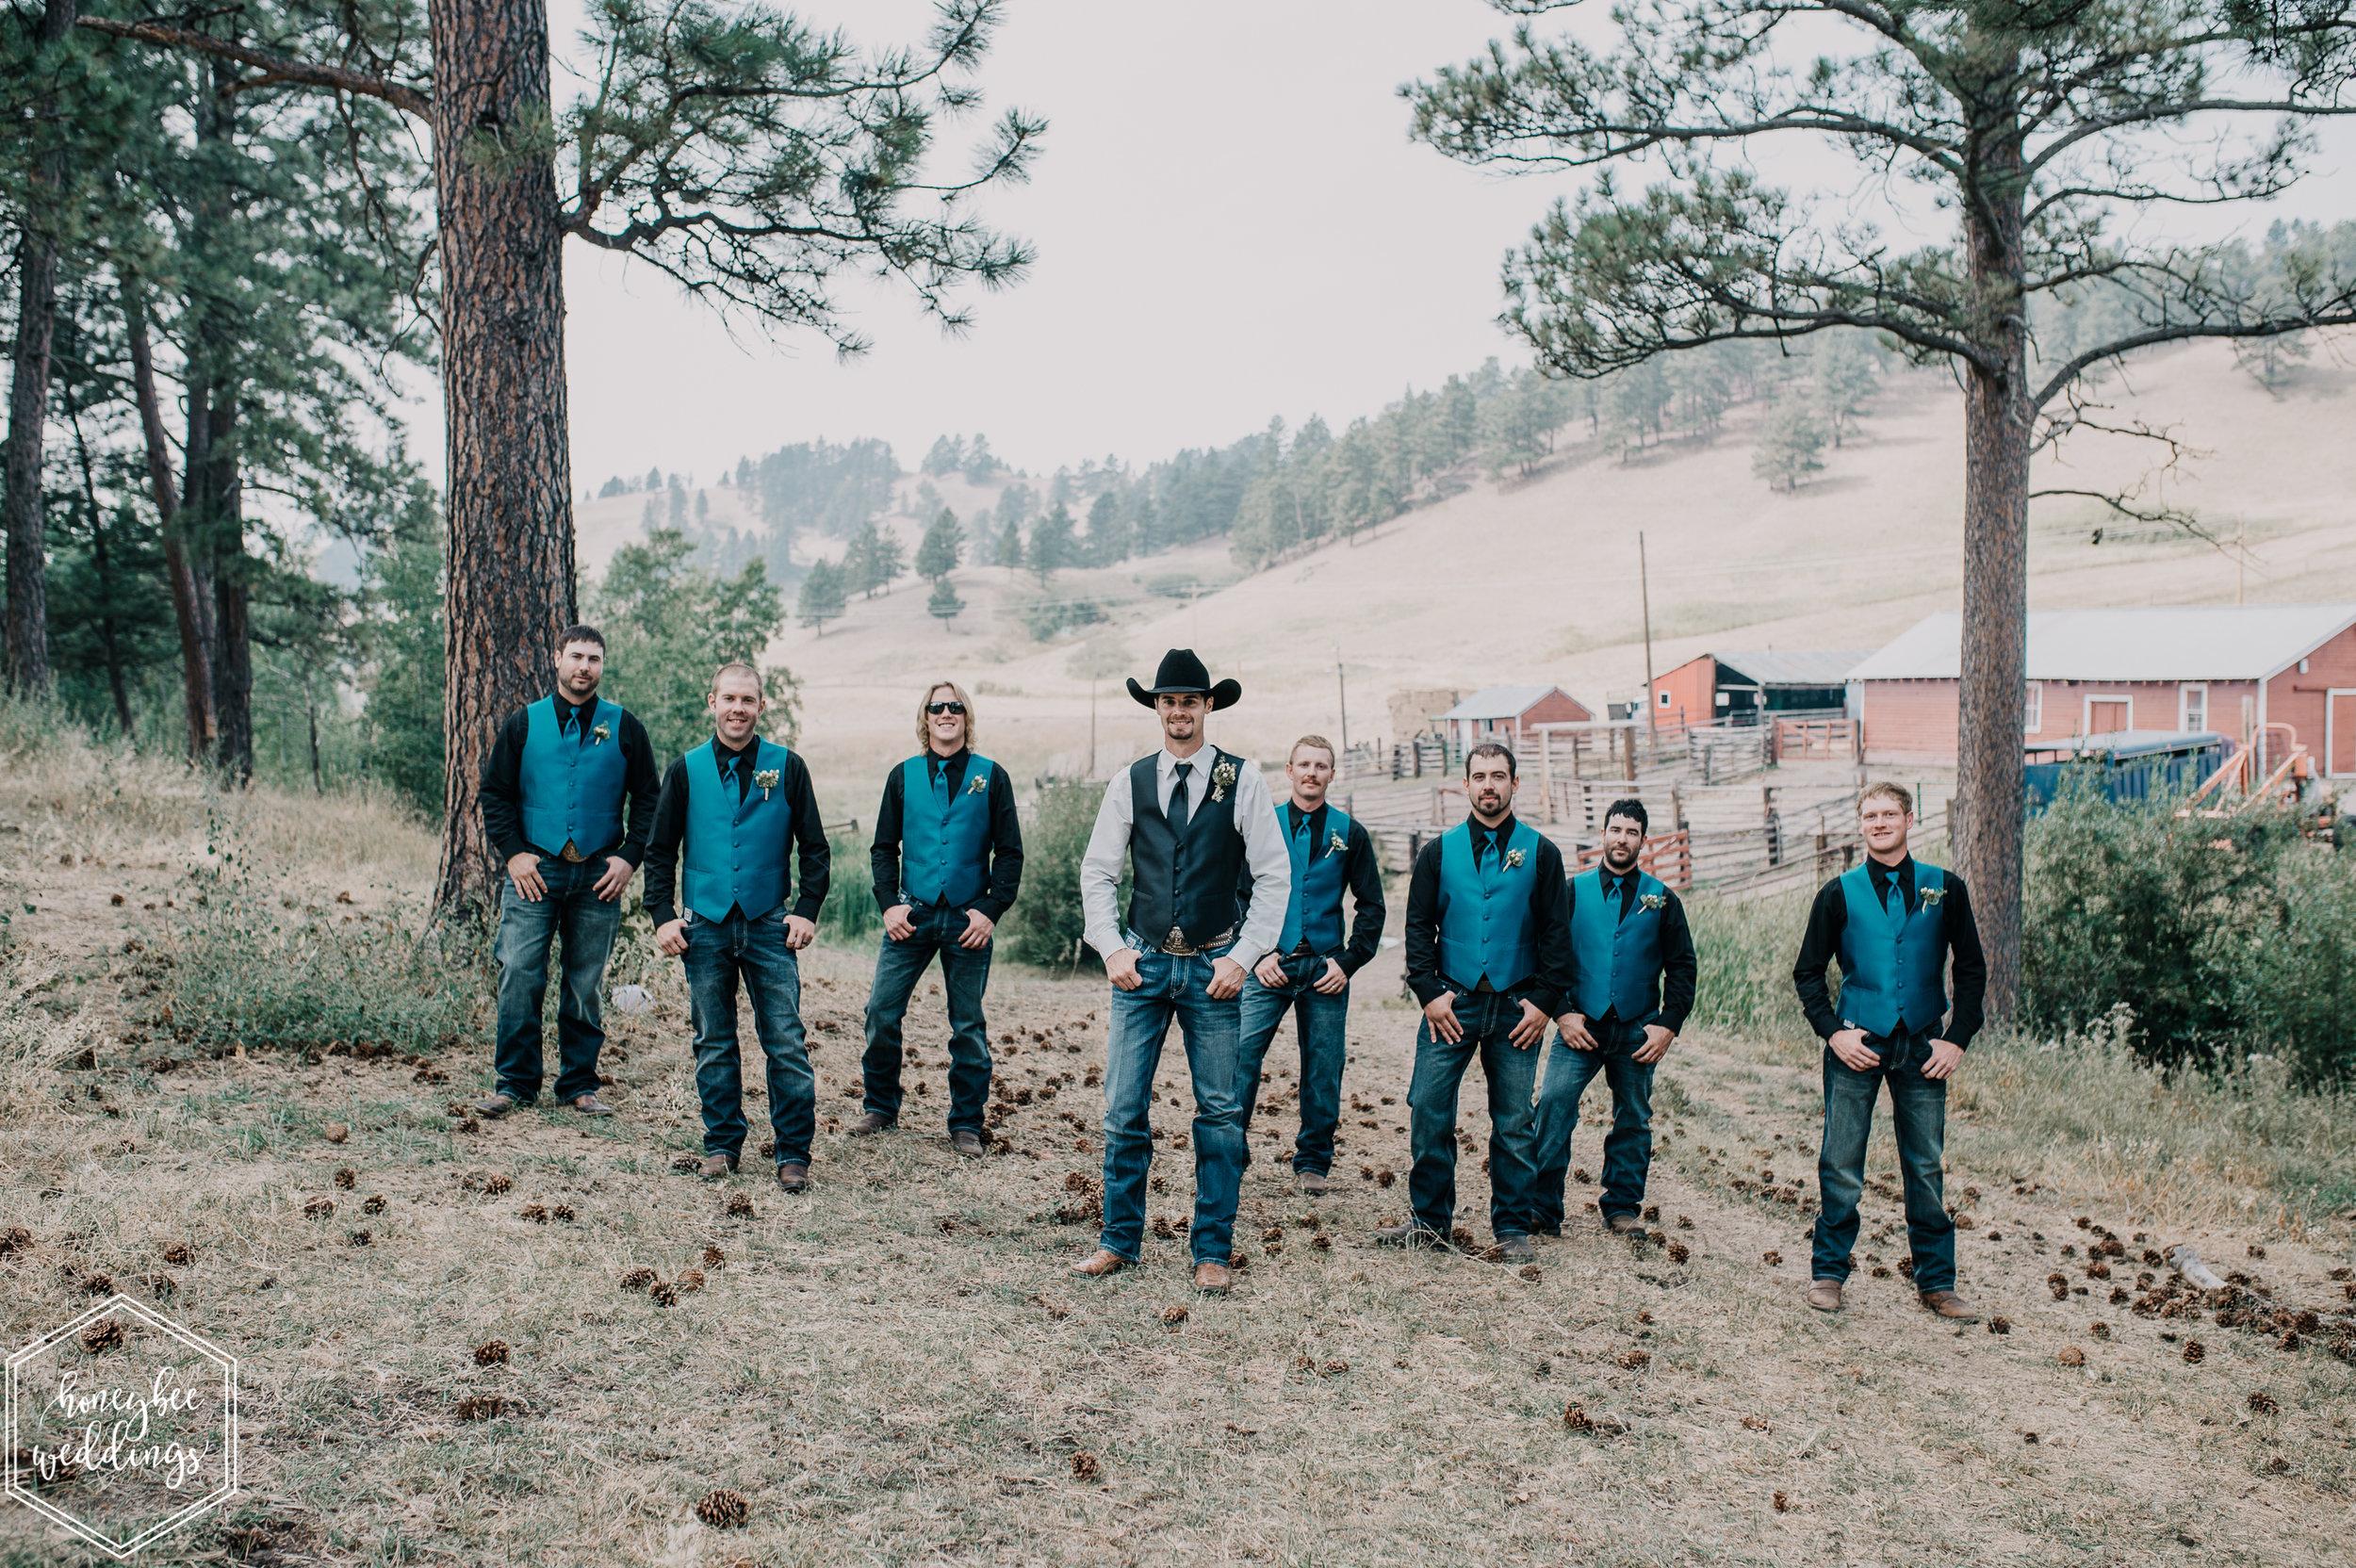 0020Havre Wedding_Ranch Wedding_Montana Wedding Photographer_Katlyn Kenyon + Jade Nystrom_August 25, 2018-121.jpg